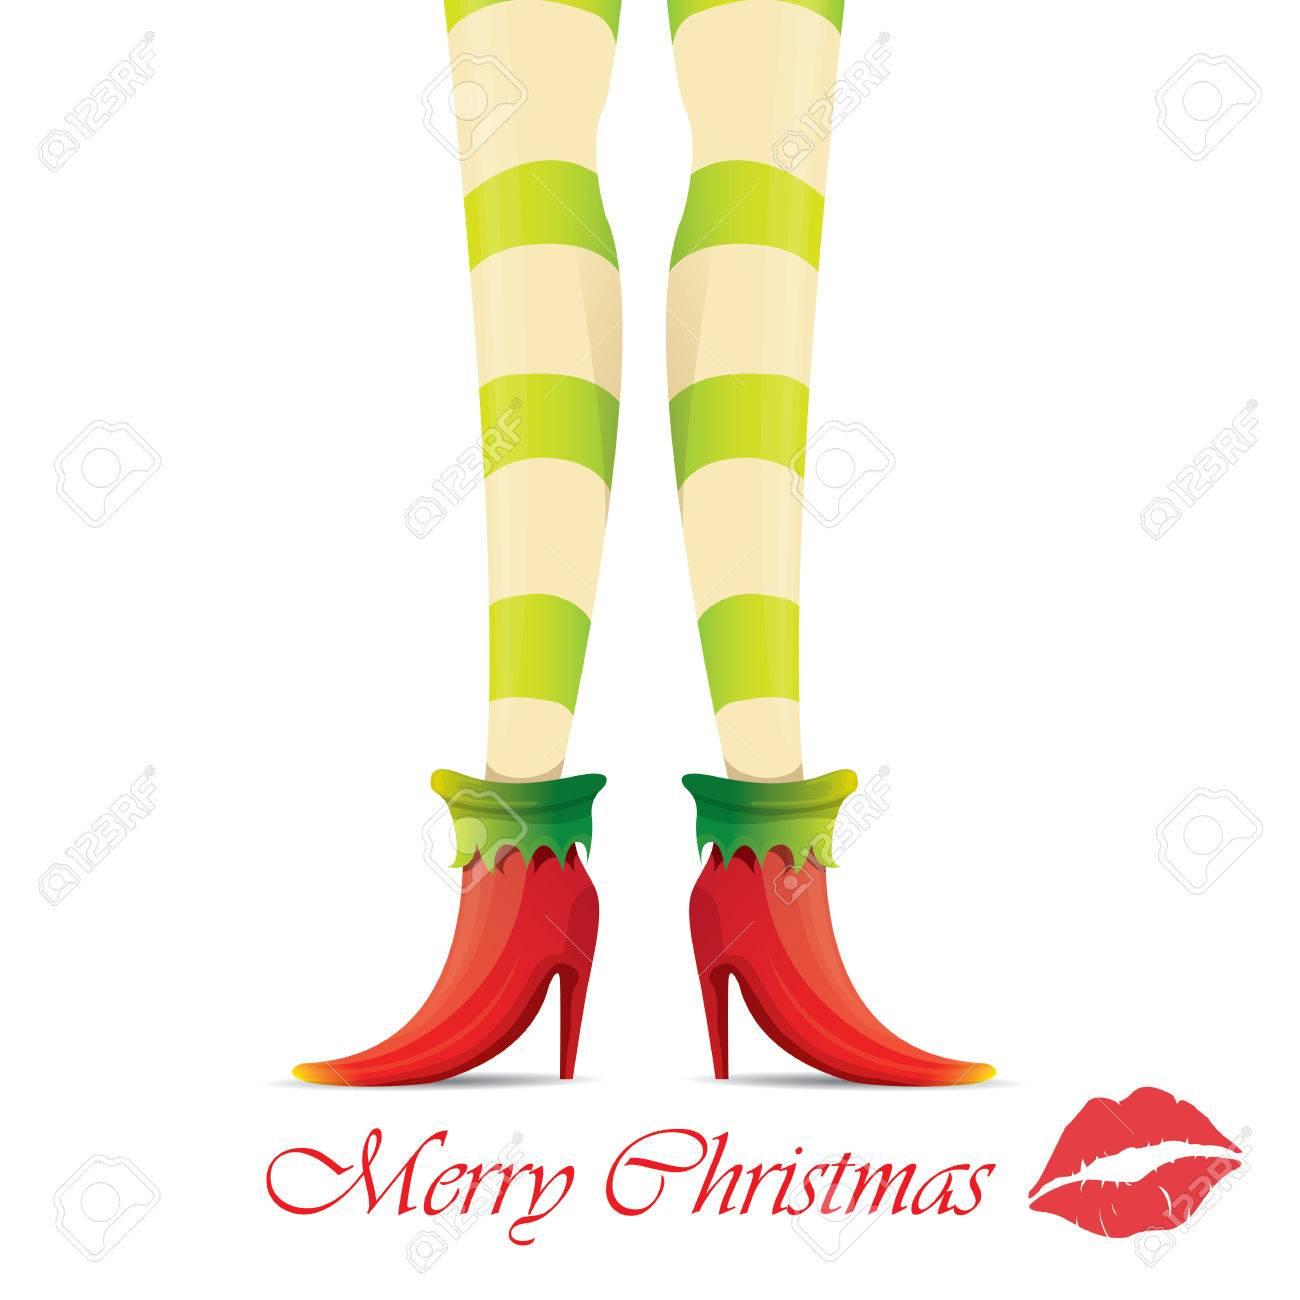 creative merry christmas greeting card with cartoon elf girls rh 123rf com